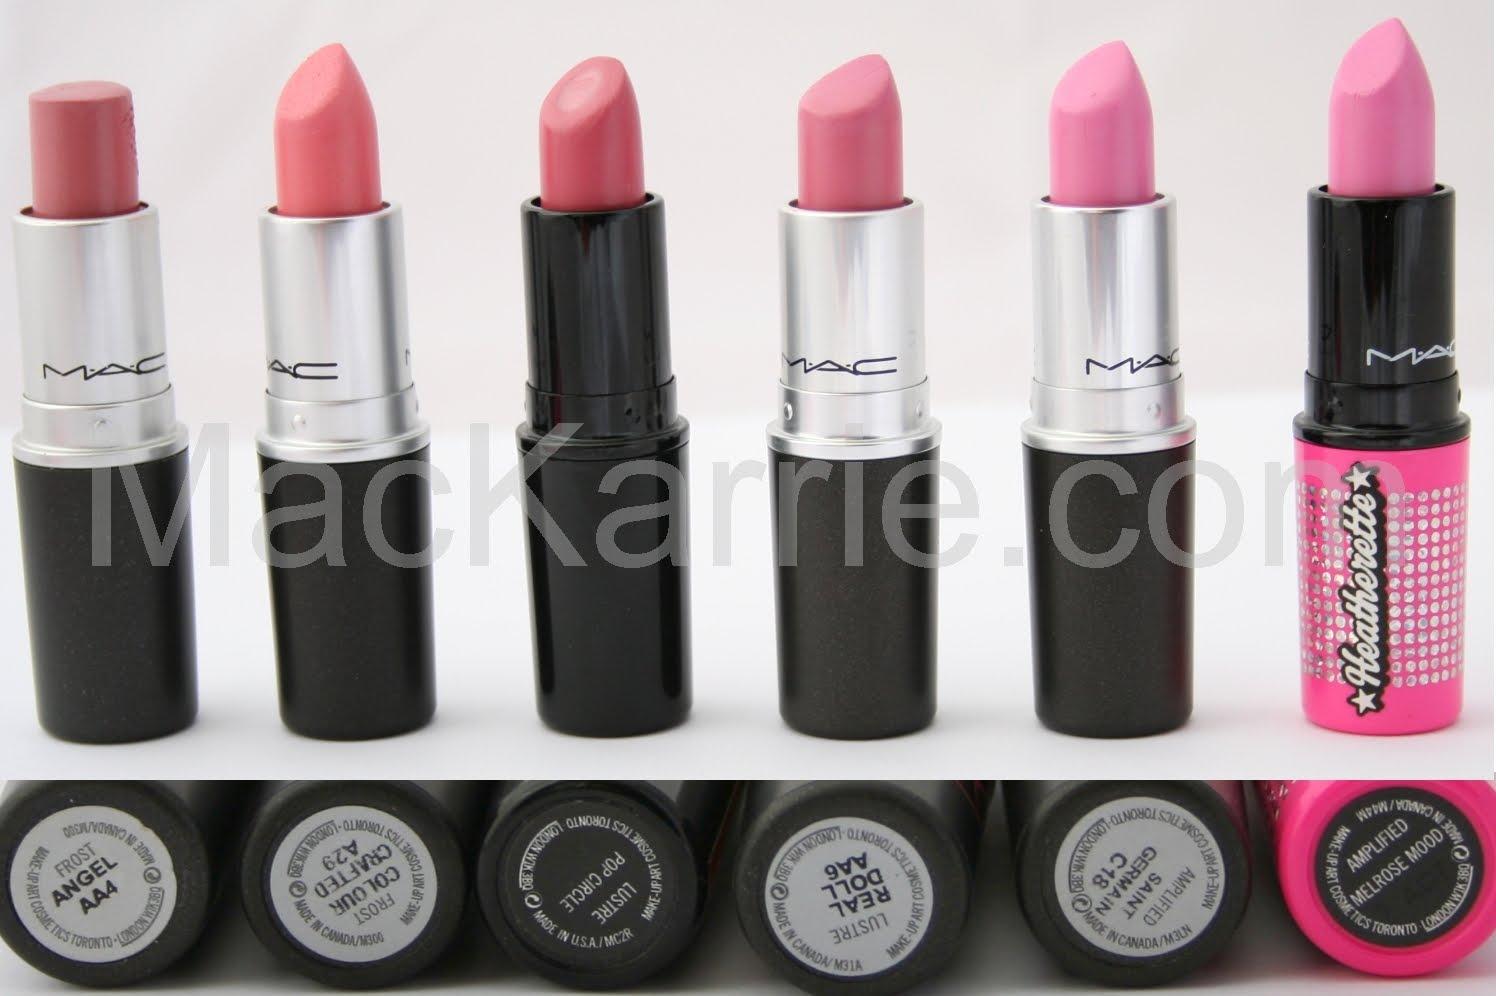 mackarrie beauty style blog mac lipsticks fotos. Black Bedroom Furniture Sets. Home Design Ideas